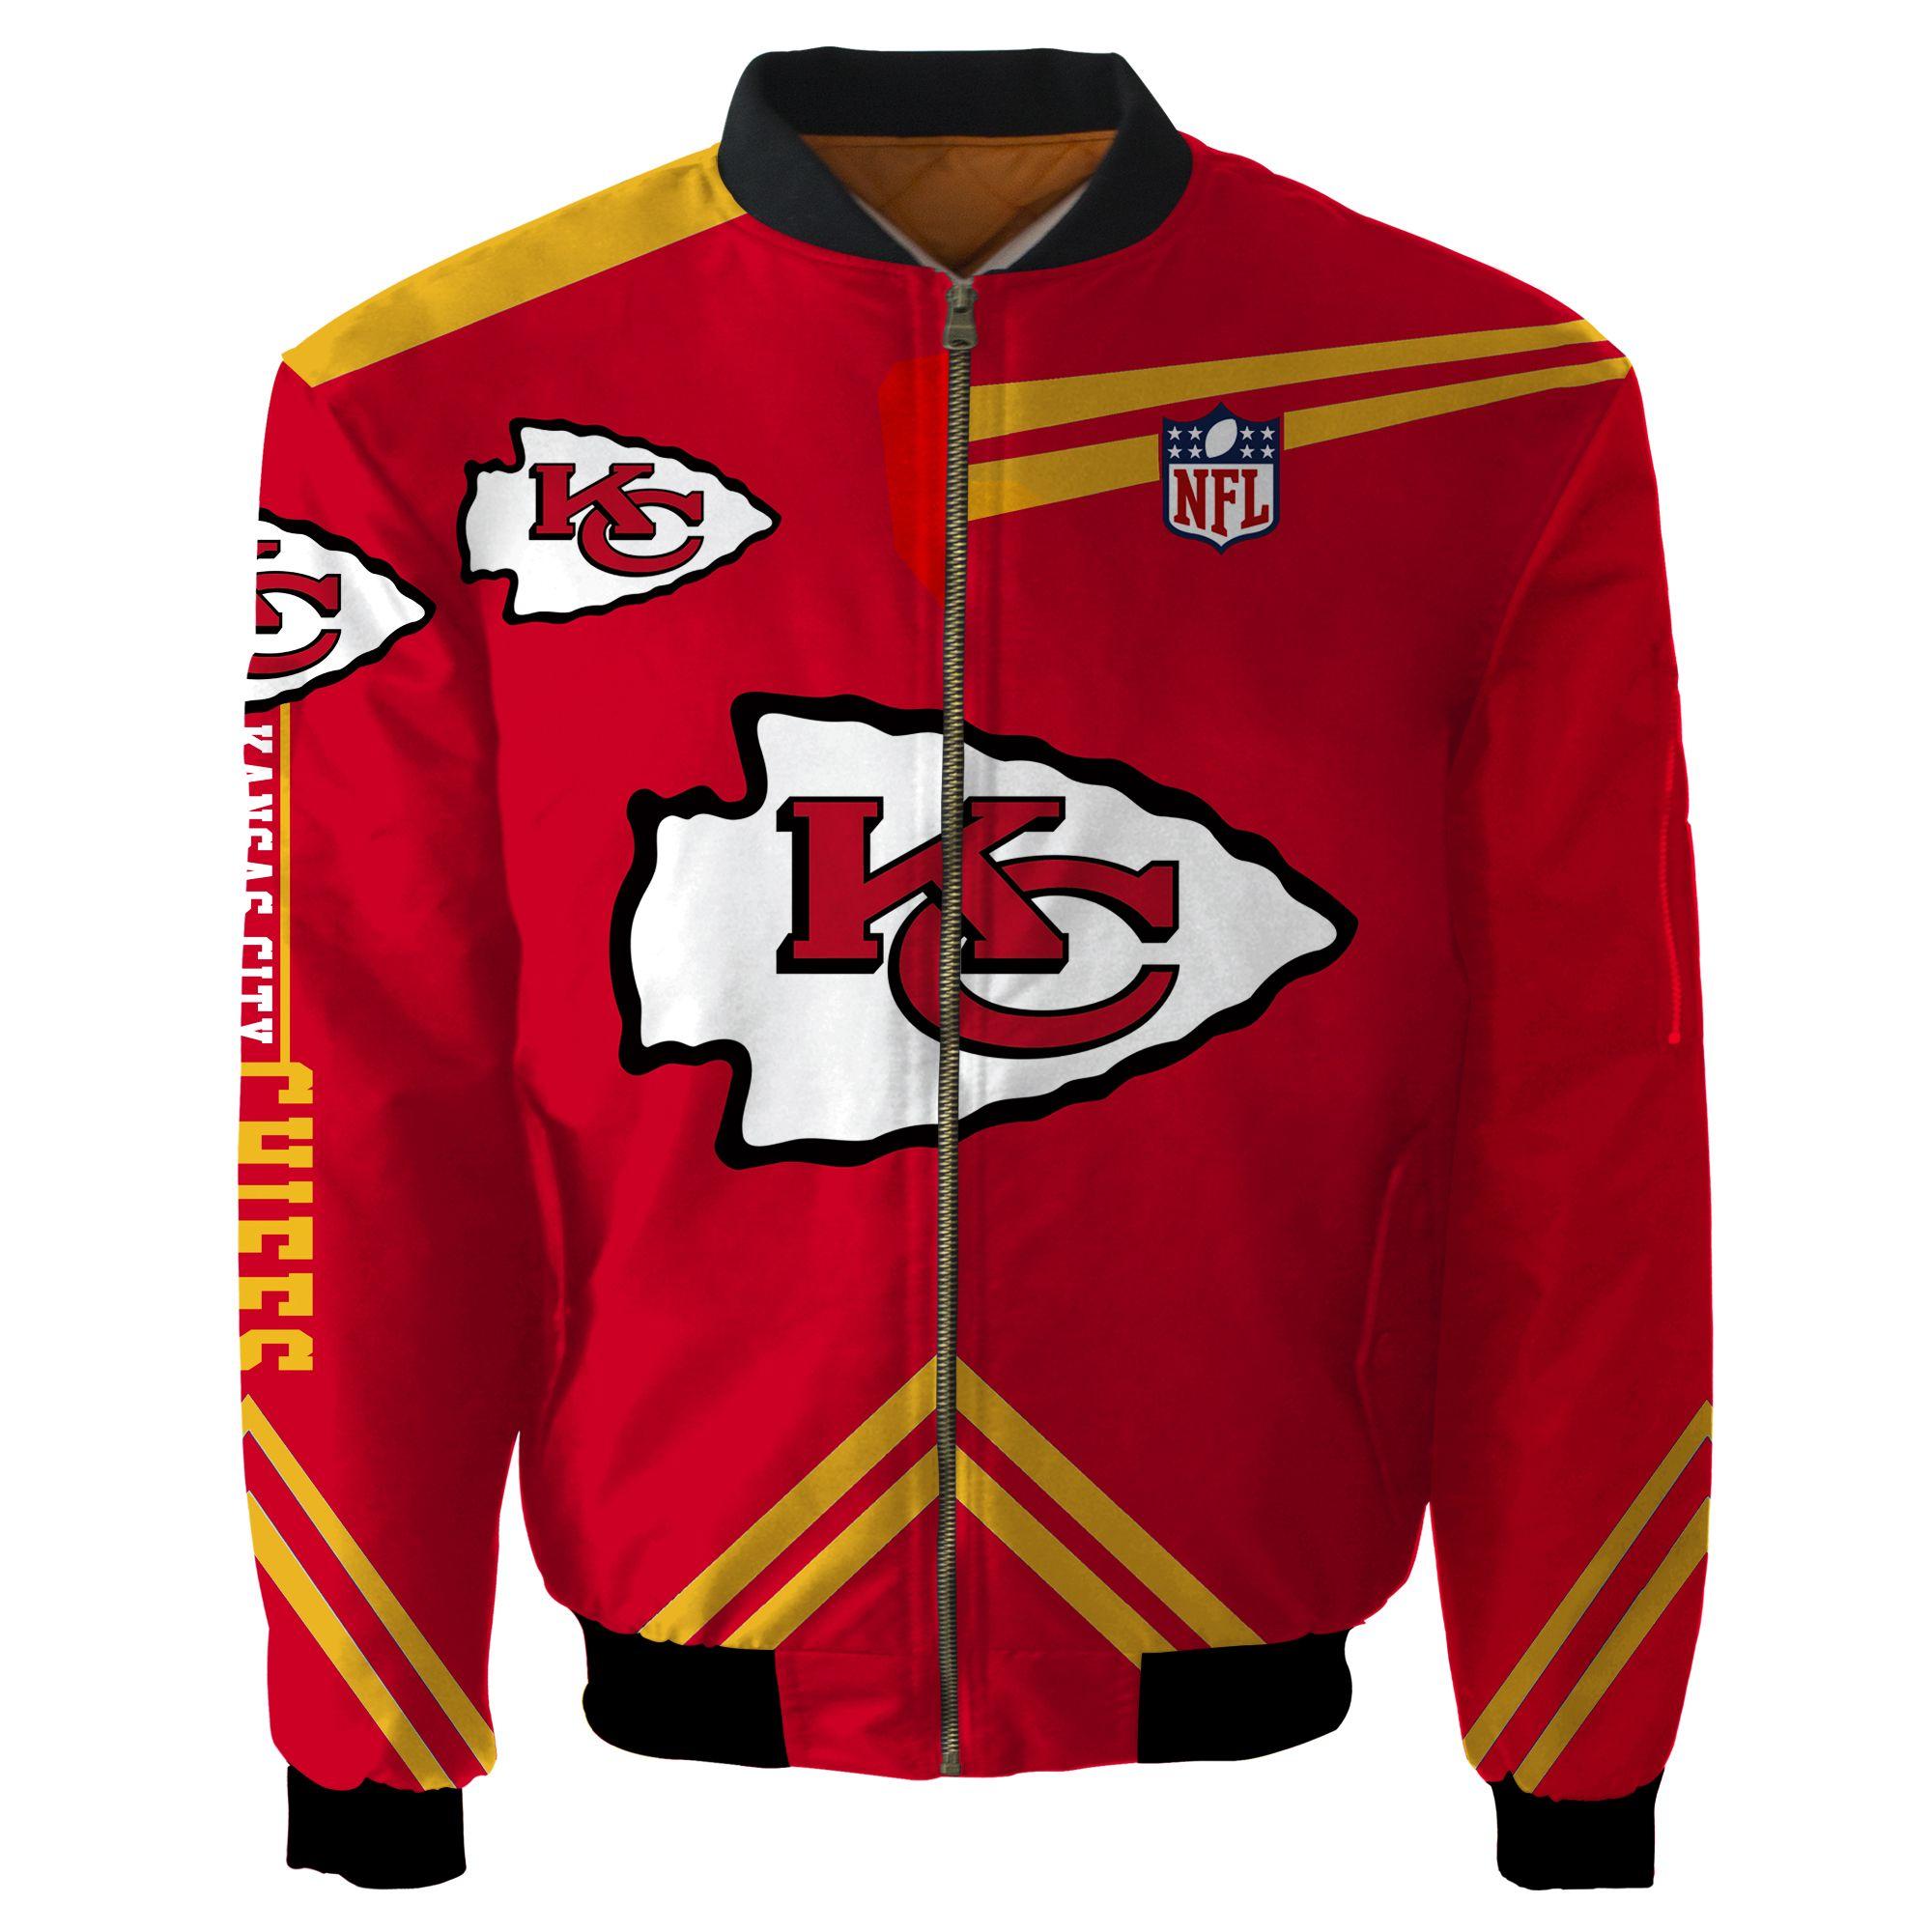 Kansas City Chiefs Bomber Jacket Men Women CottonPadded